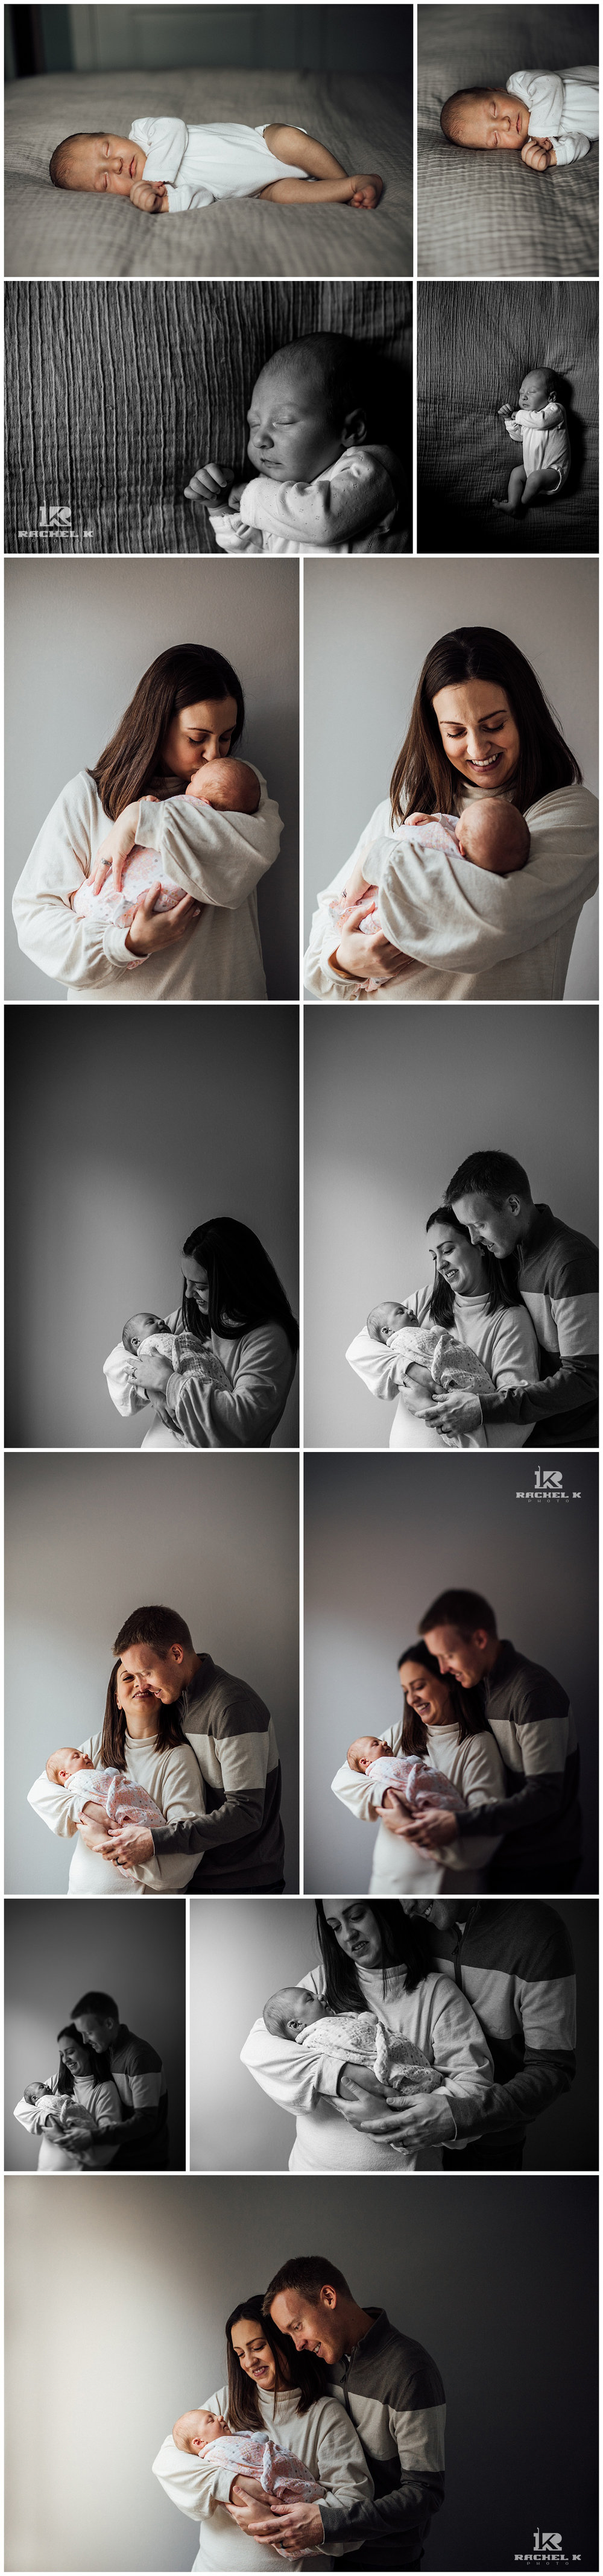 Arlington newborn lifestyle session by Rachel K Photo